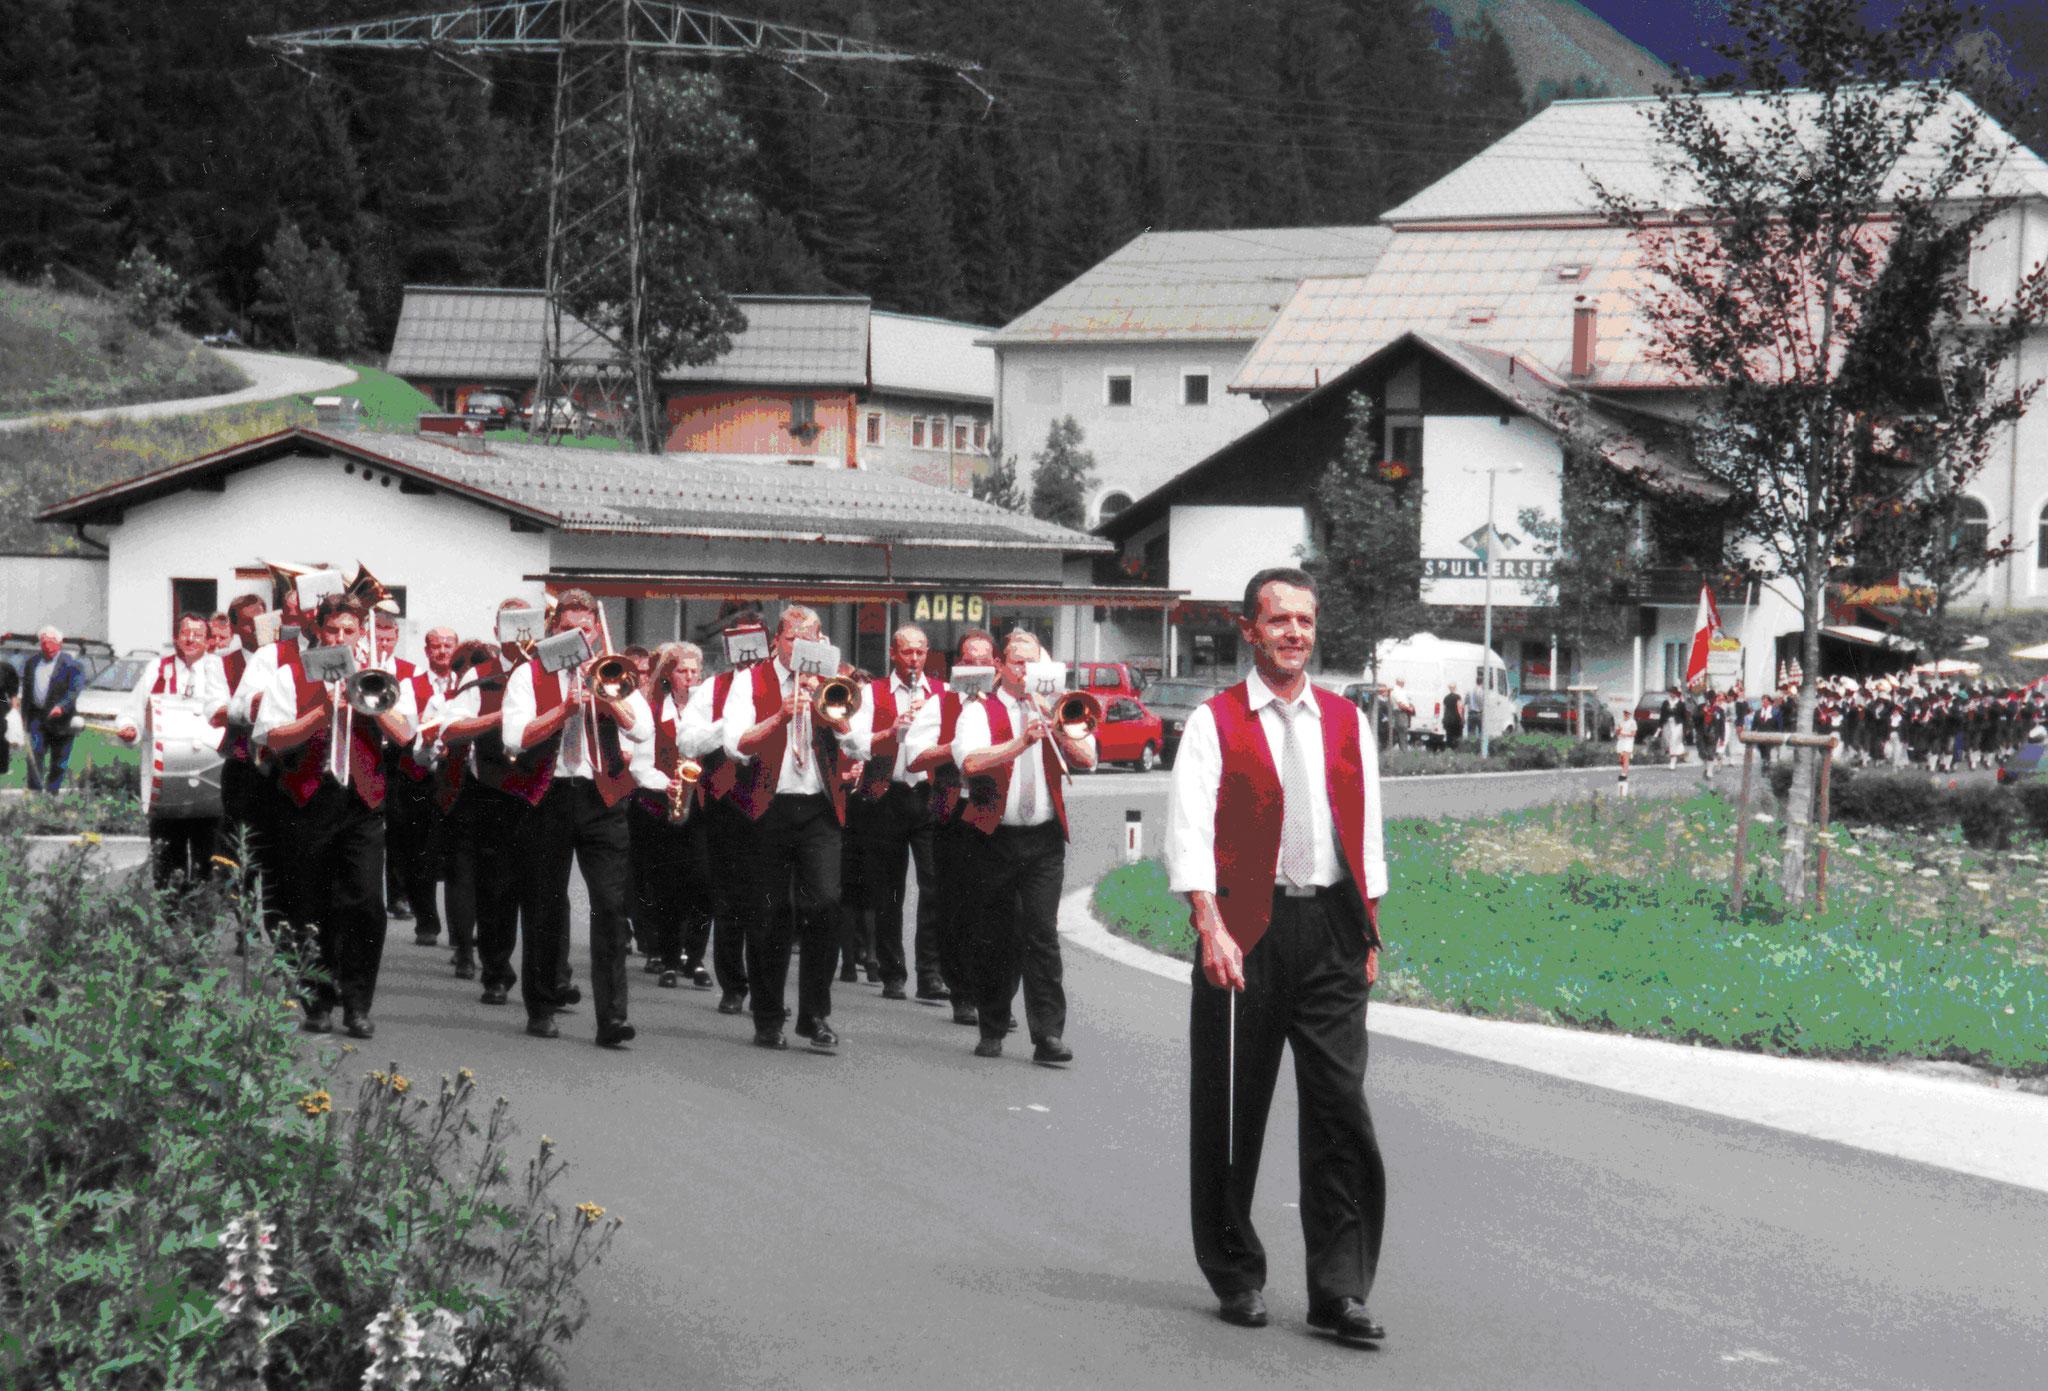 1998 Wald am Arlberg – Festumzug